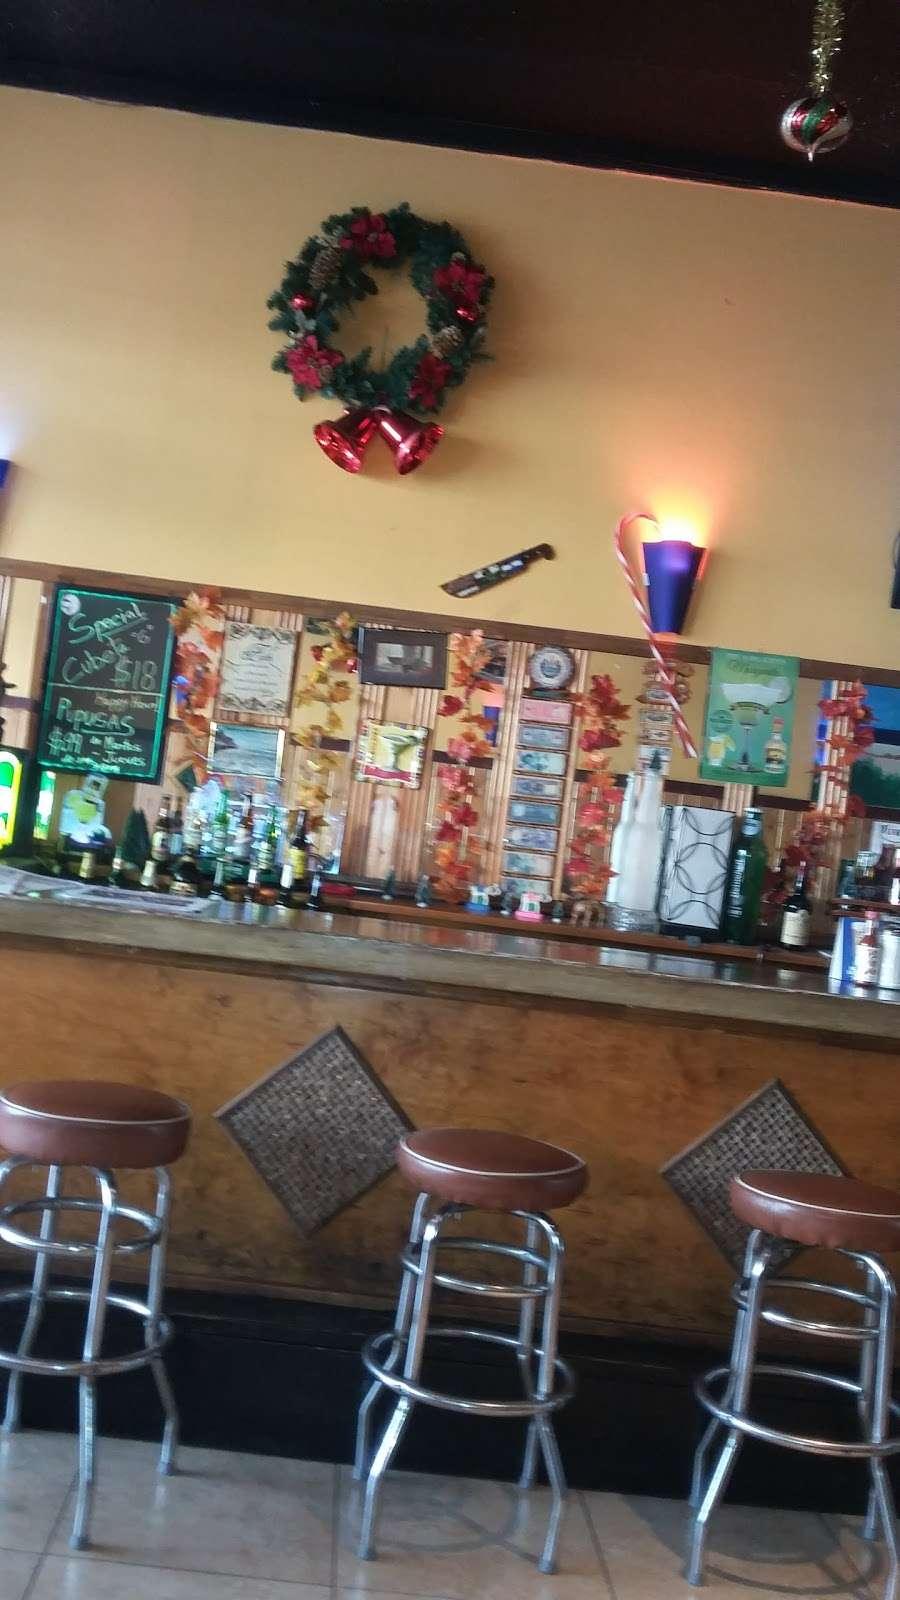 Little San Salvador Restaurant - restaurant  | Photo 8 of 10 | Address: 901 N Western Ave Suite #3, Los Angeles, CA 90029, USA | Phone: (323) 466-0565